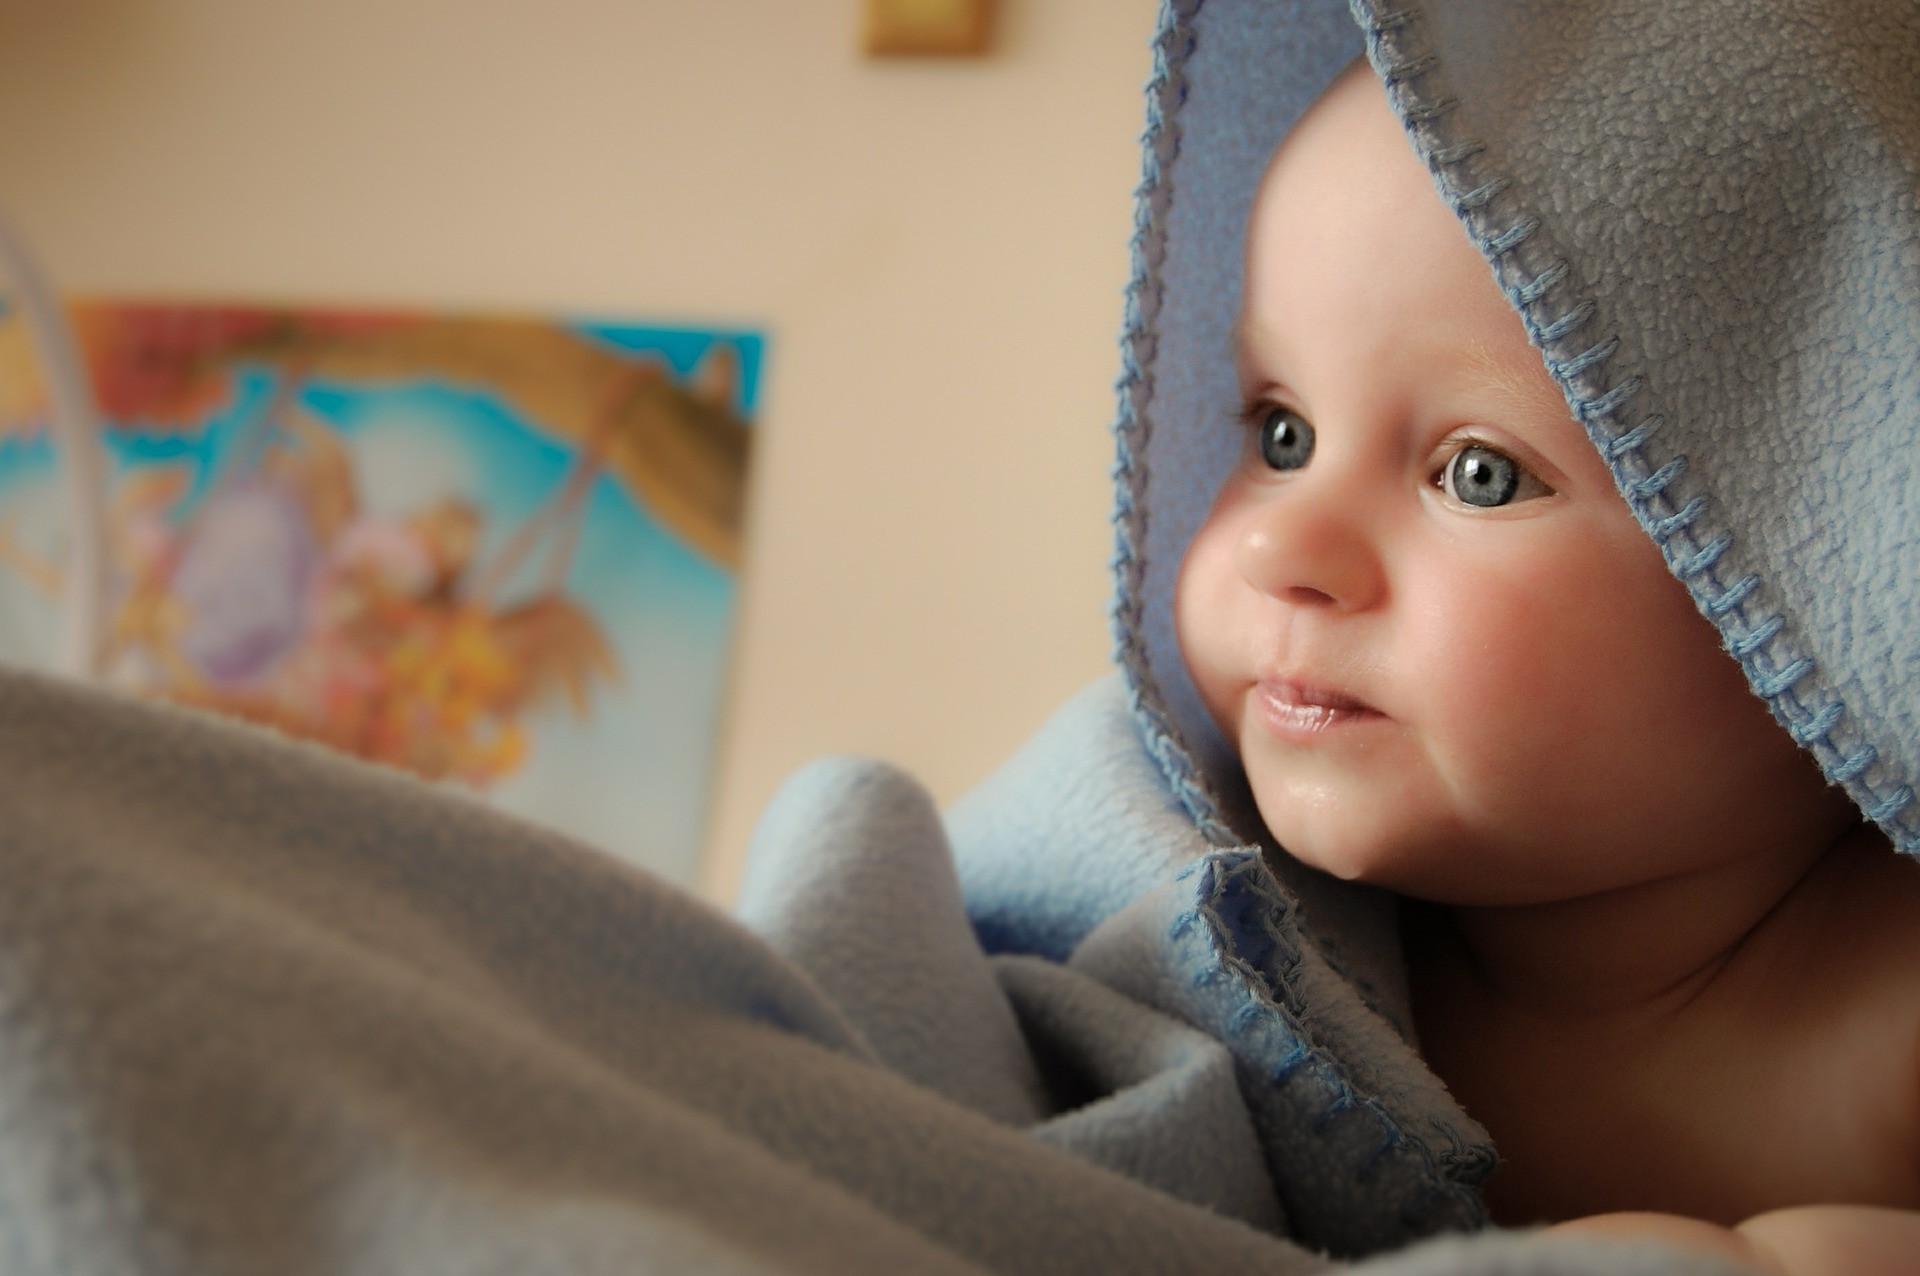 child-428377_1920_edited.jpg